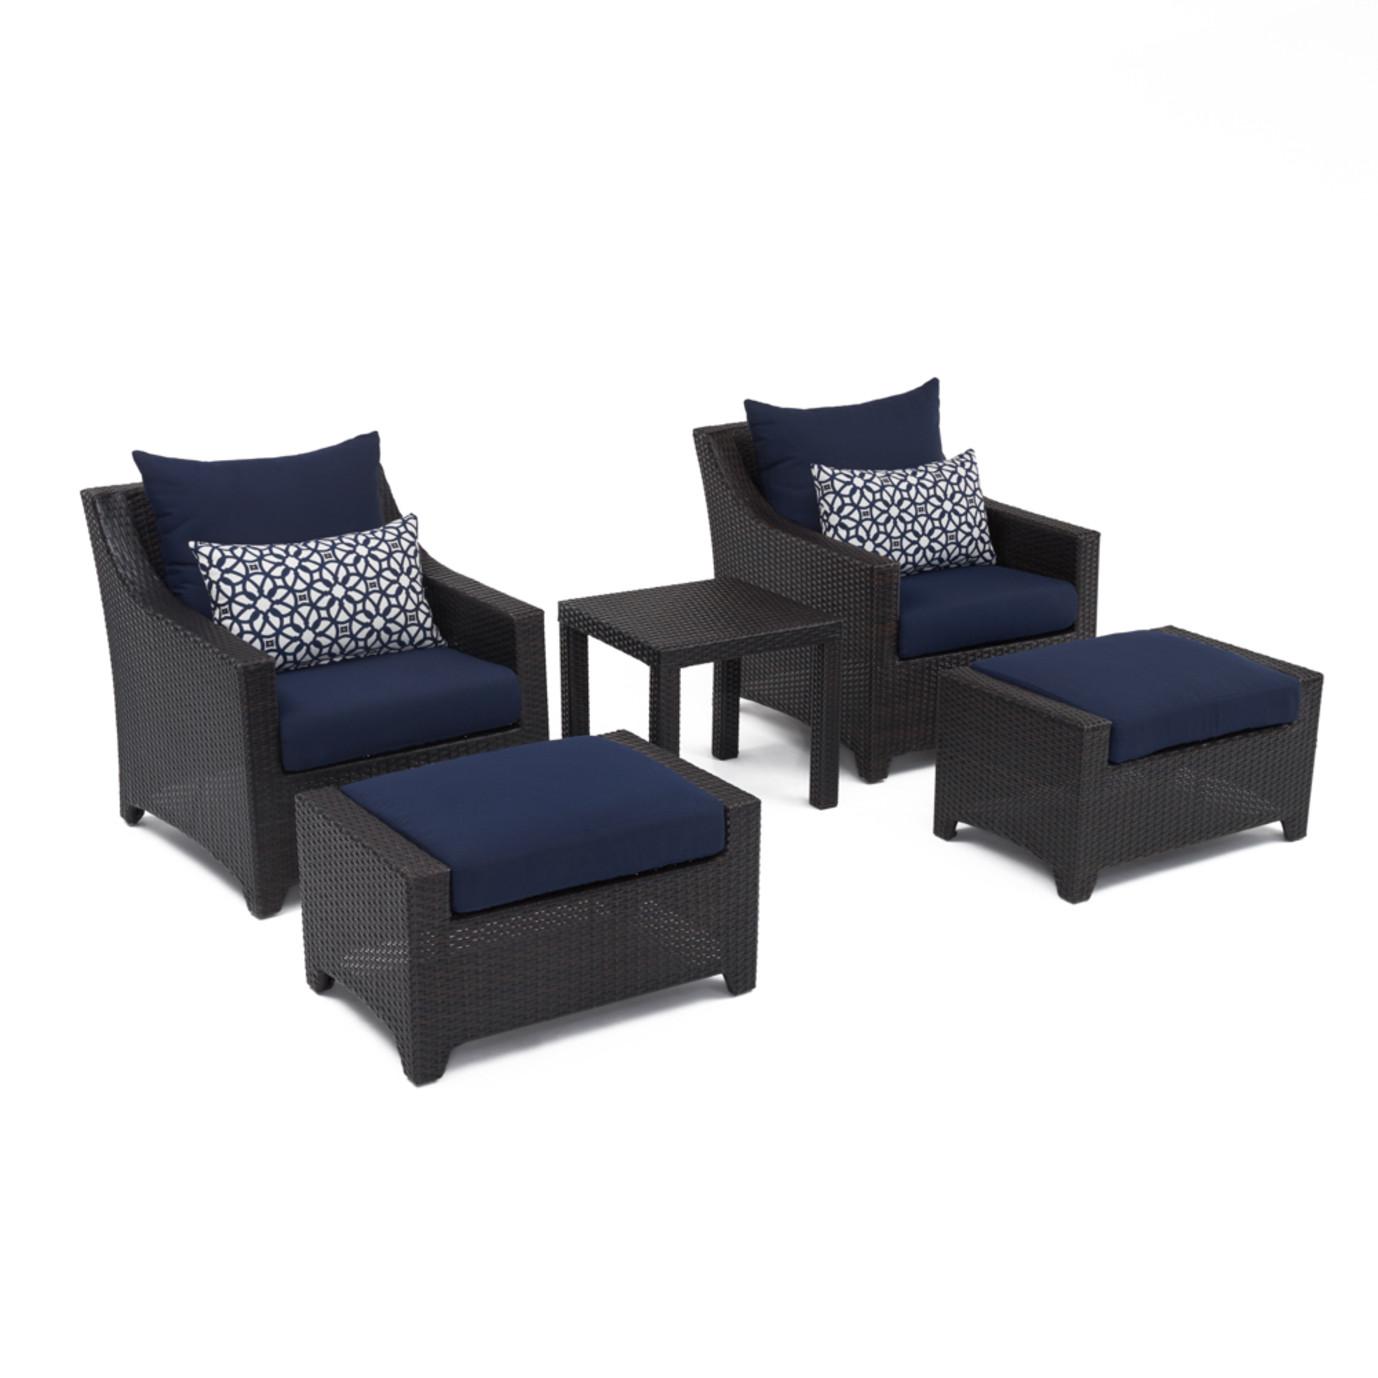 Deco™ 5 Piece Club Chair and Ottoman Set